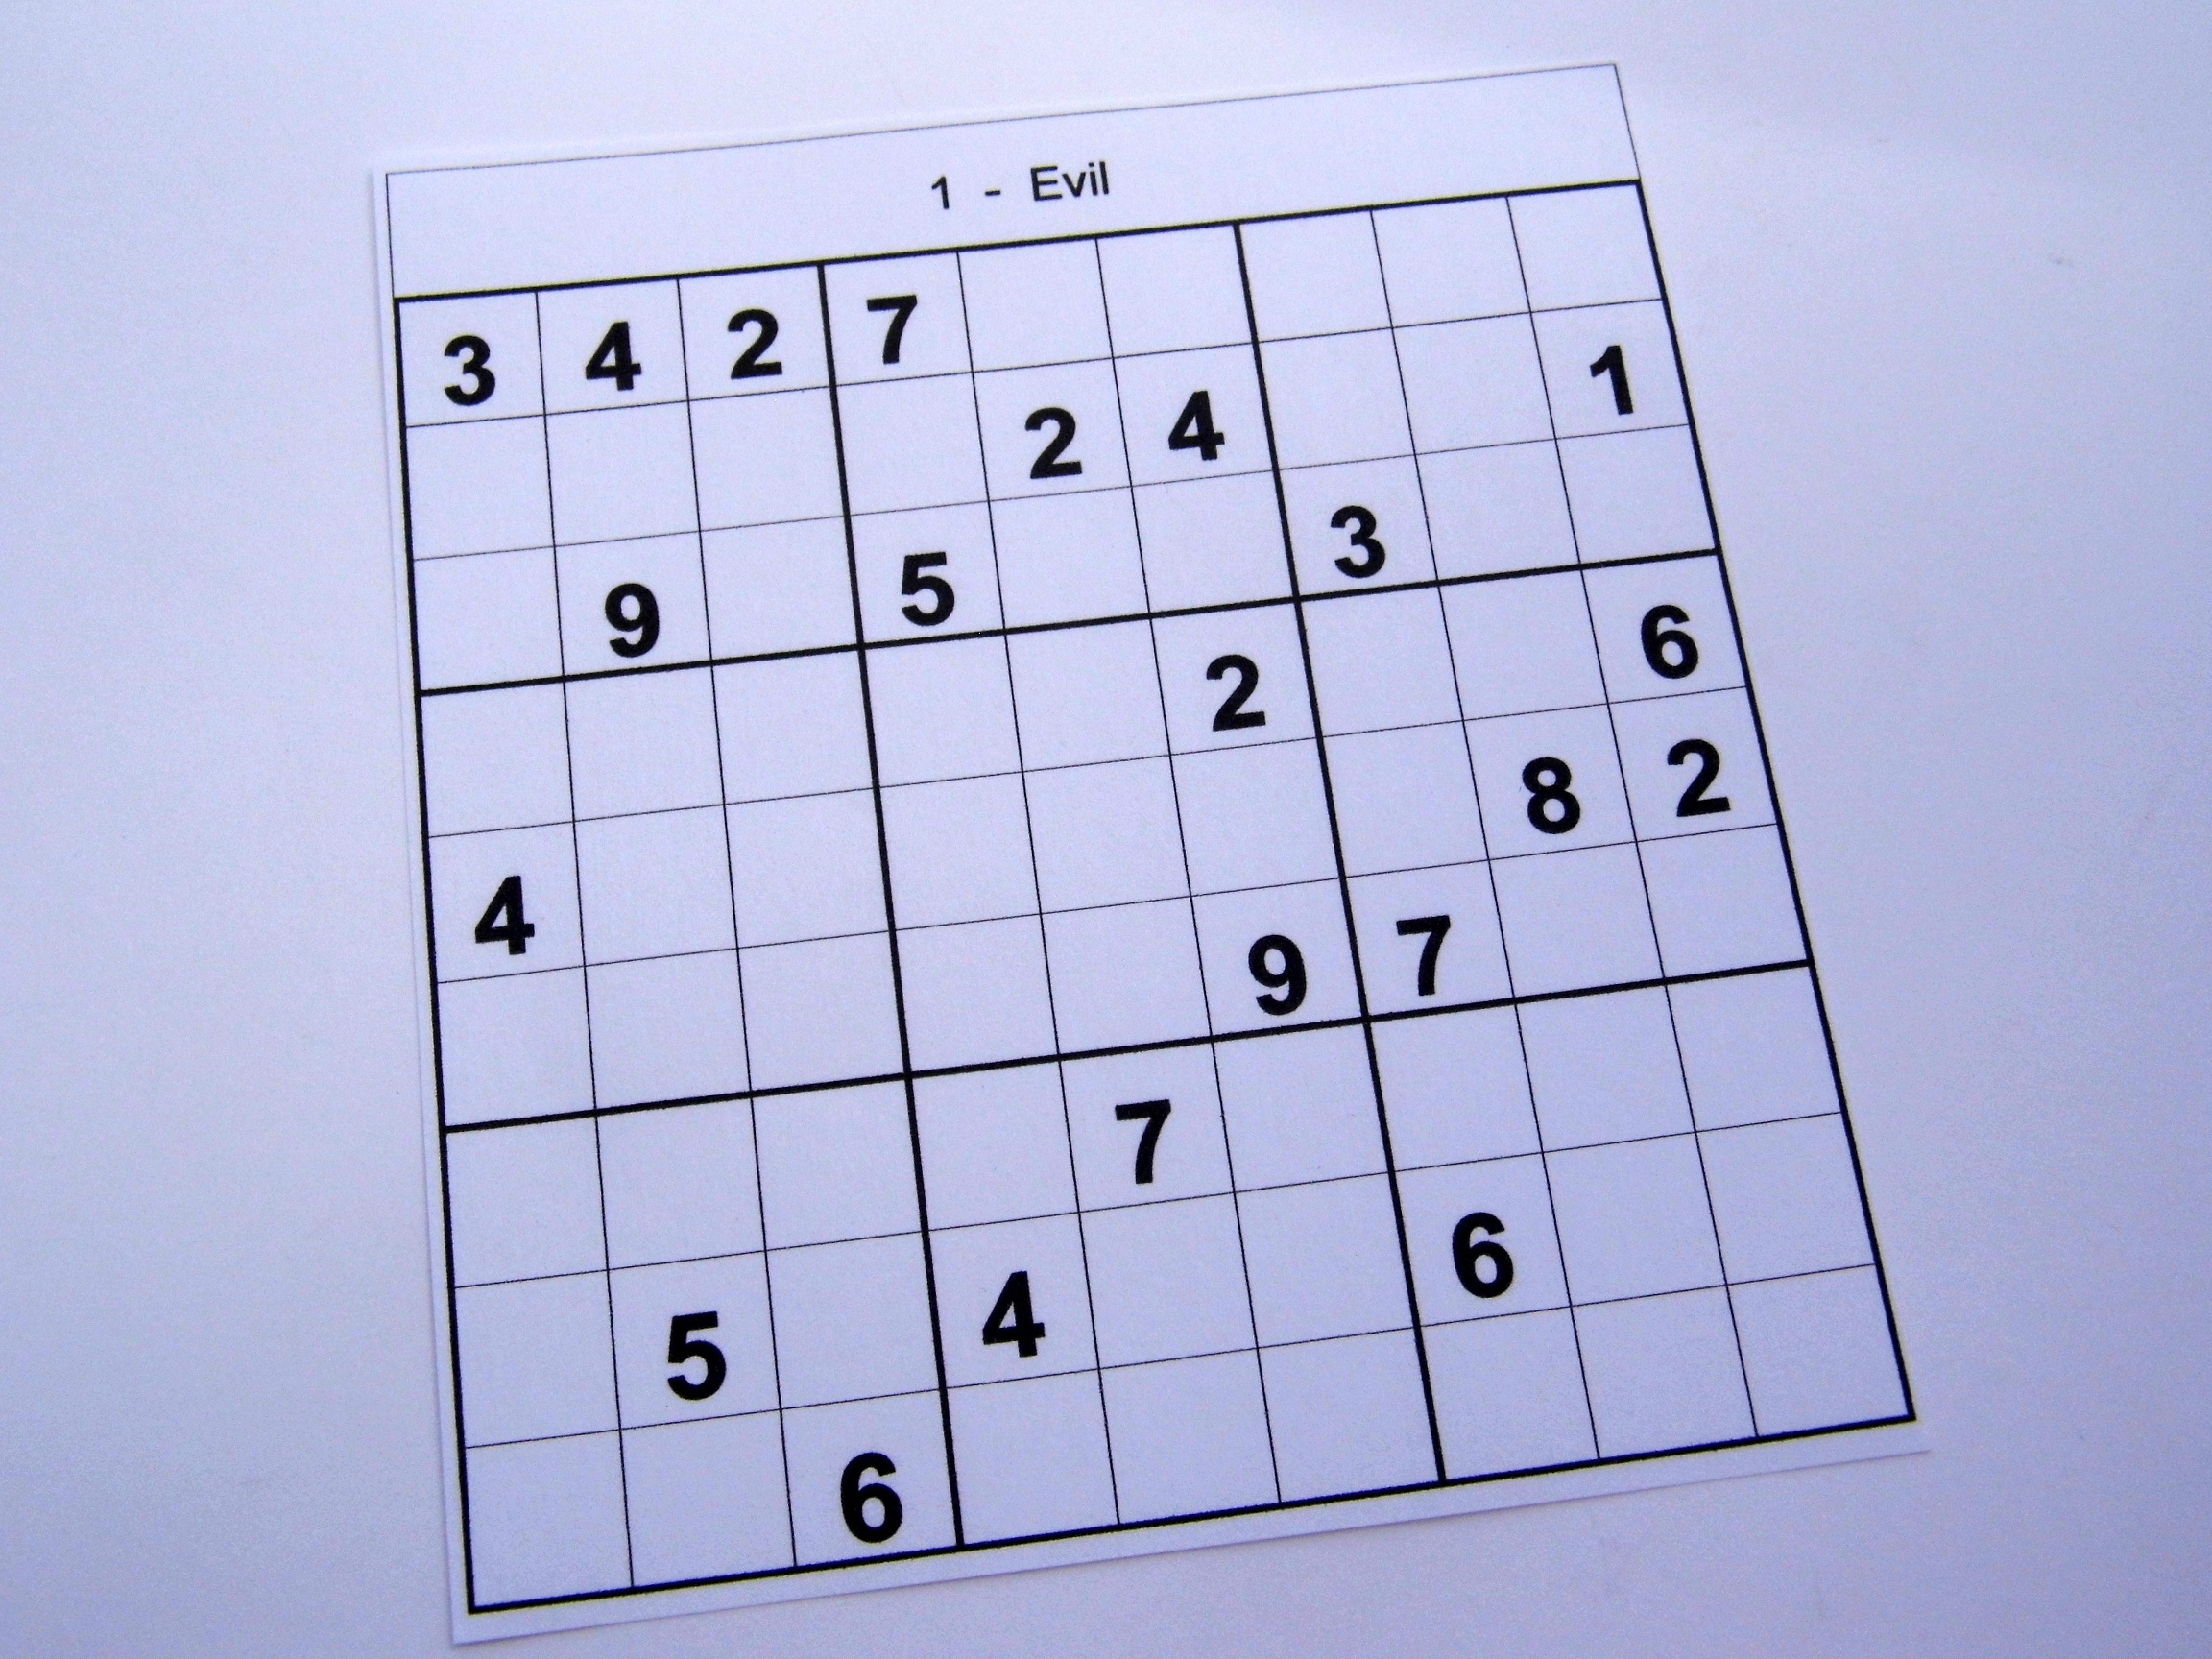 Hard Printable Sudoku Puzzles 2 Per Page – Book 1 – Free Sudoku Puzzles - Free Printable Sudoku Books